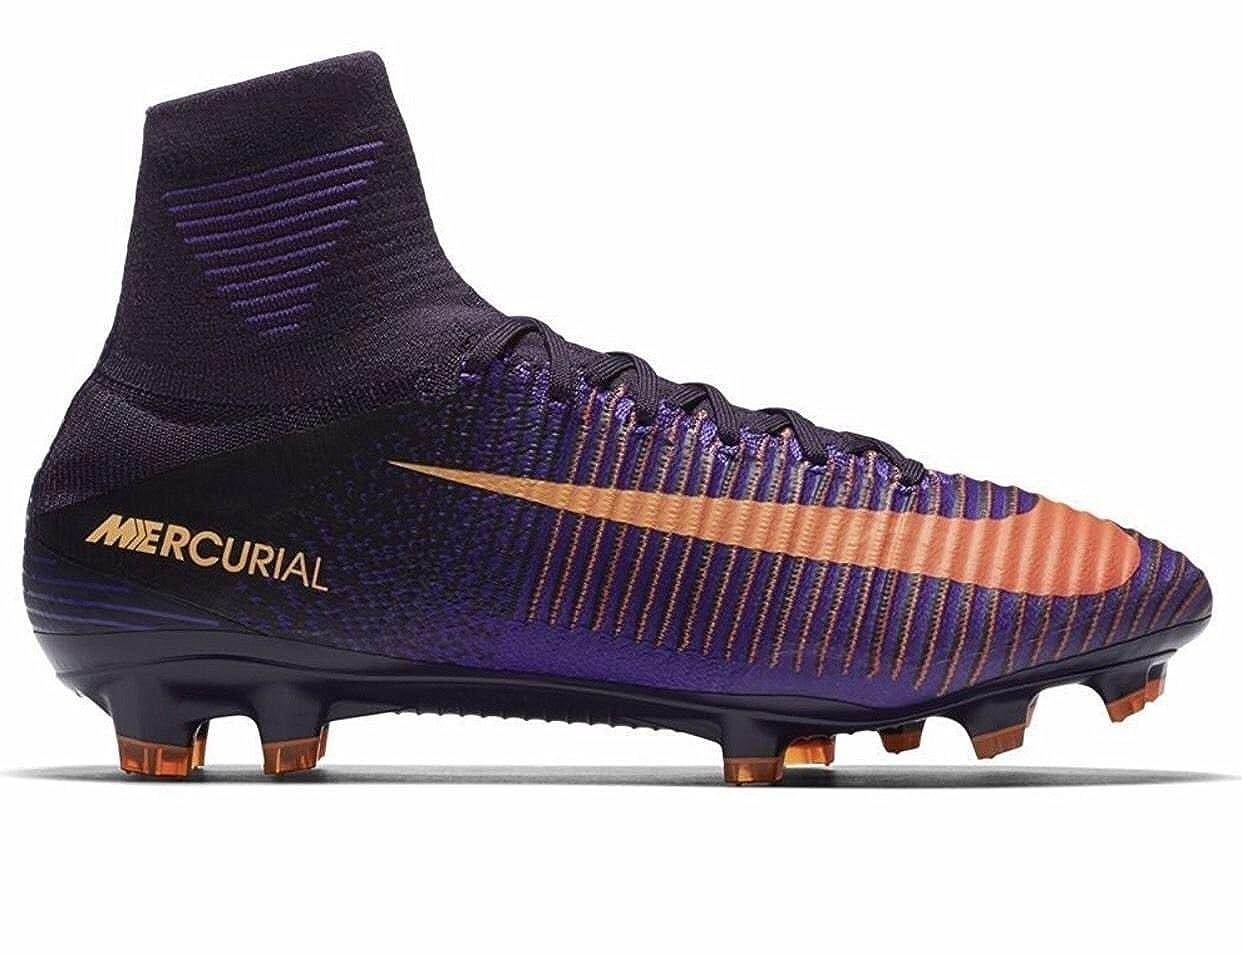 quality design d583c f894d Amazon.com  Nike Mercurial Superfly V FG Purple DynastyBright Citrus  Shoes  Soccer